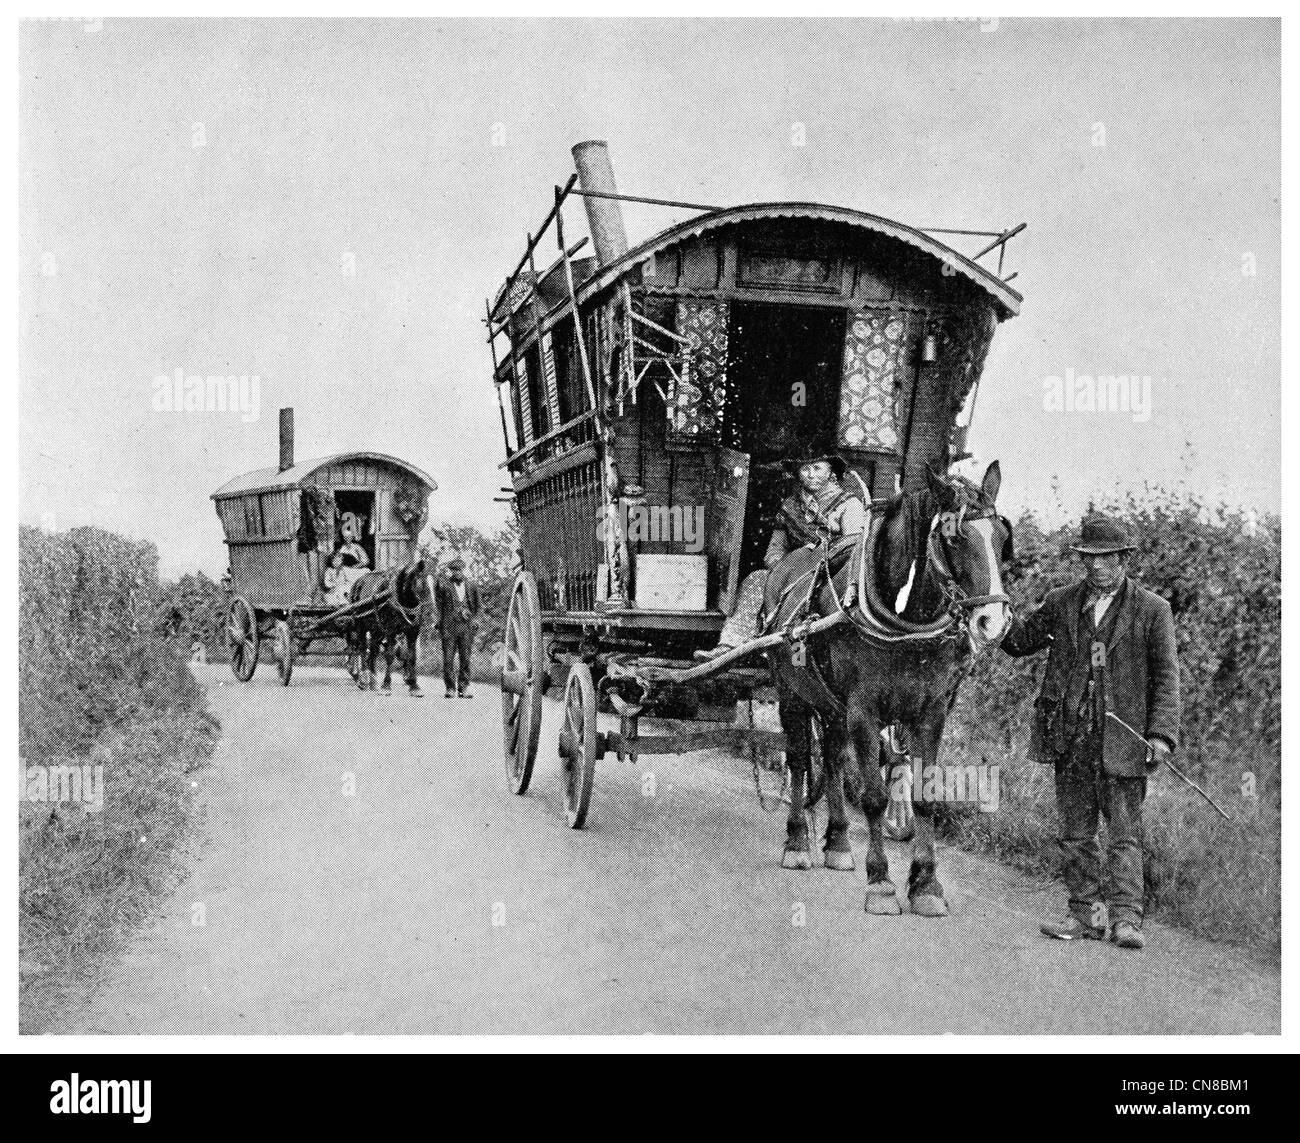 First published 1914 Gypsy caravan Surrey Romani - Stock Image